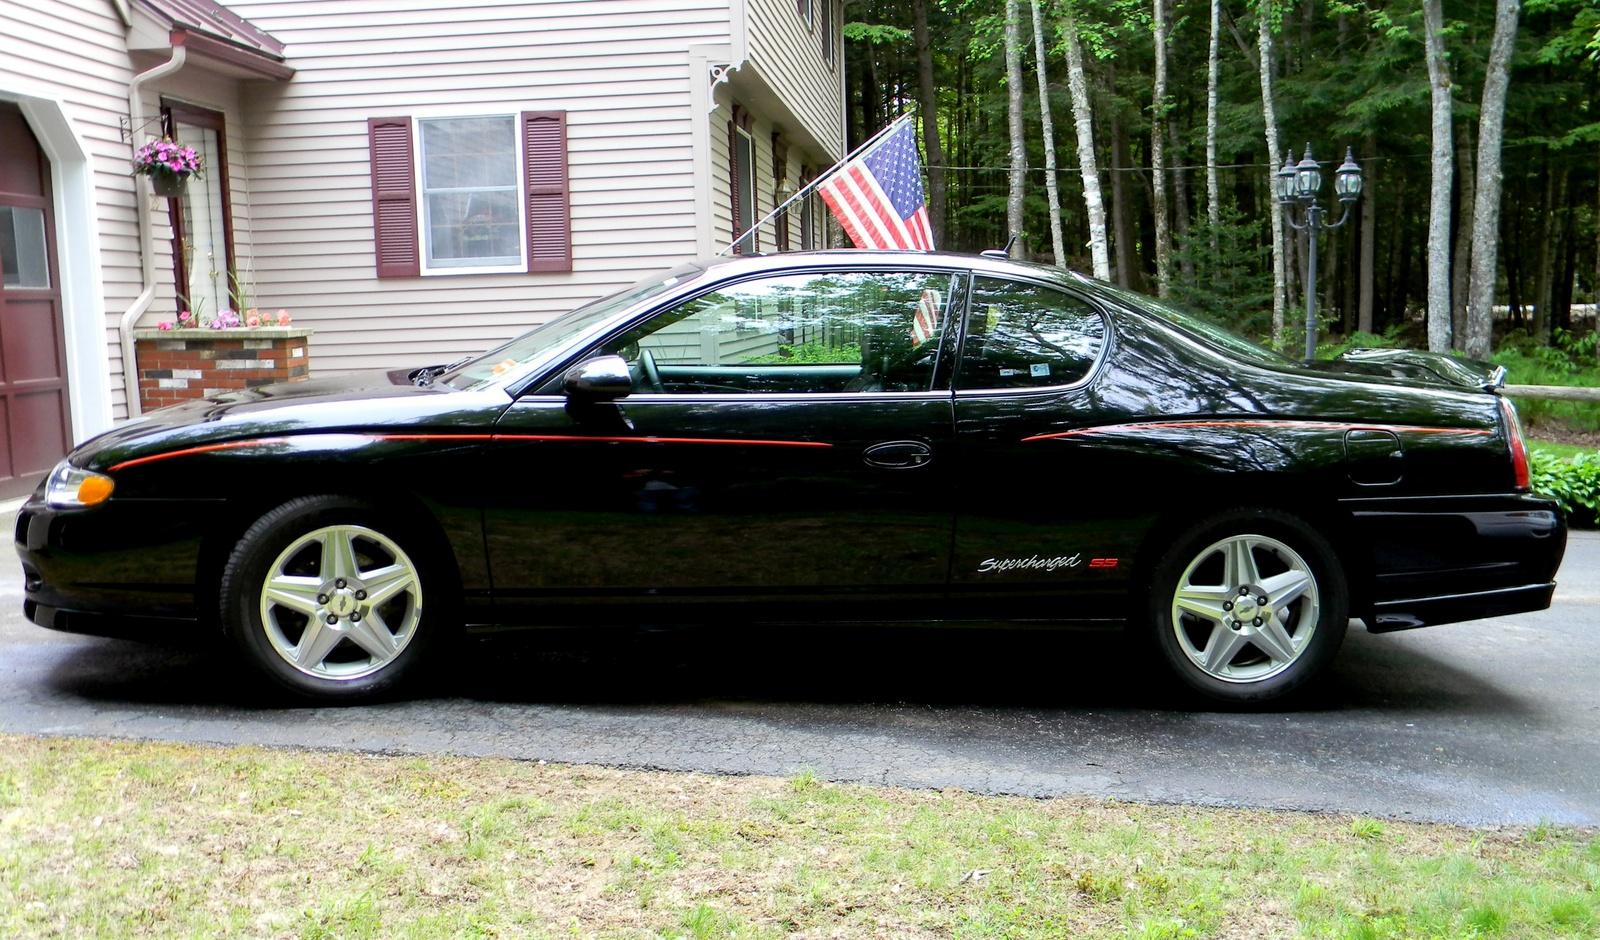 2000 Chevy Monte Carlo Ss Upcomingcarshq Com